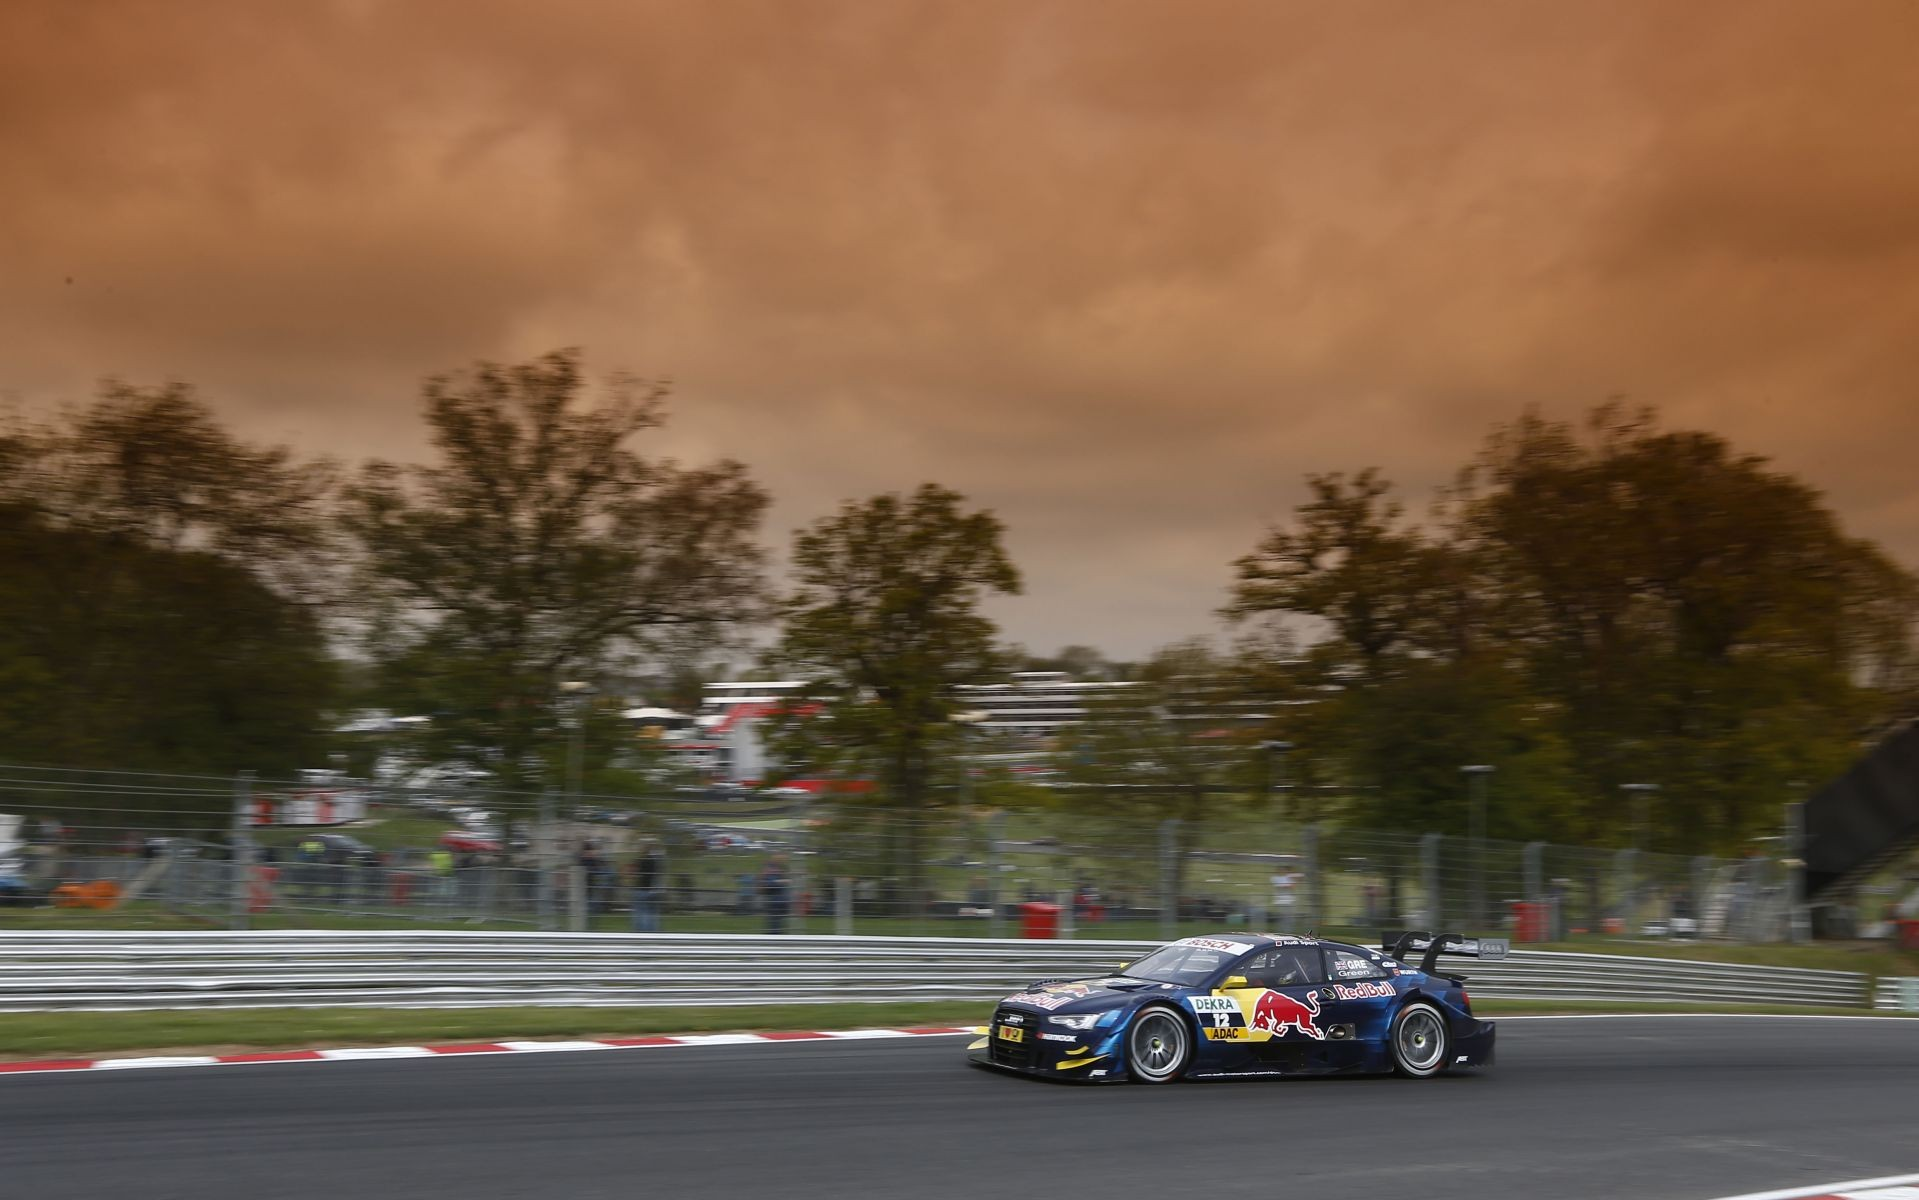 Audi racing - 1919x1200